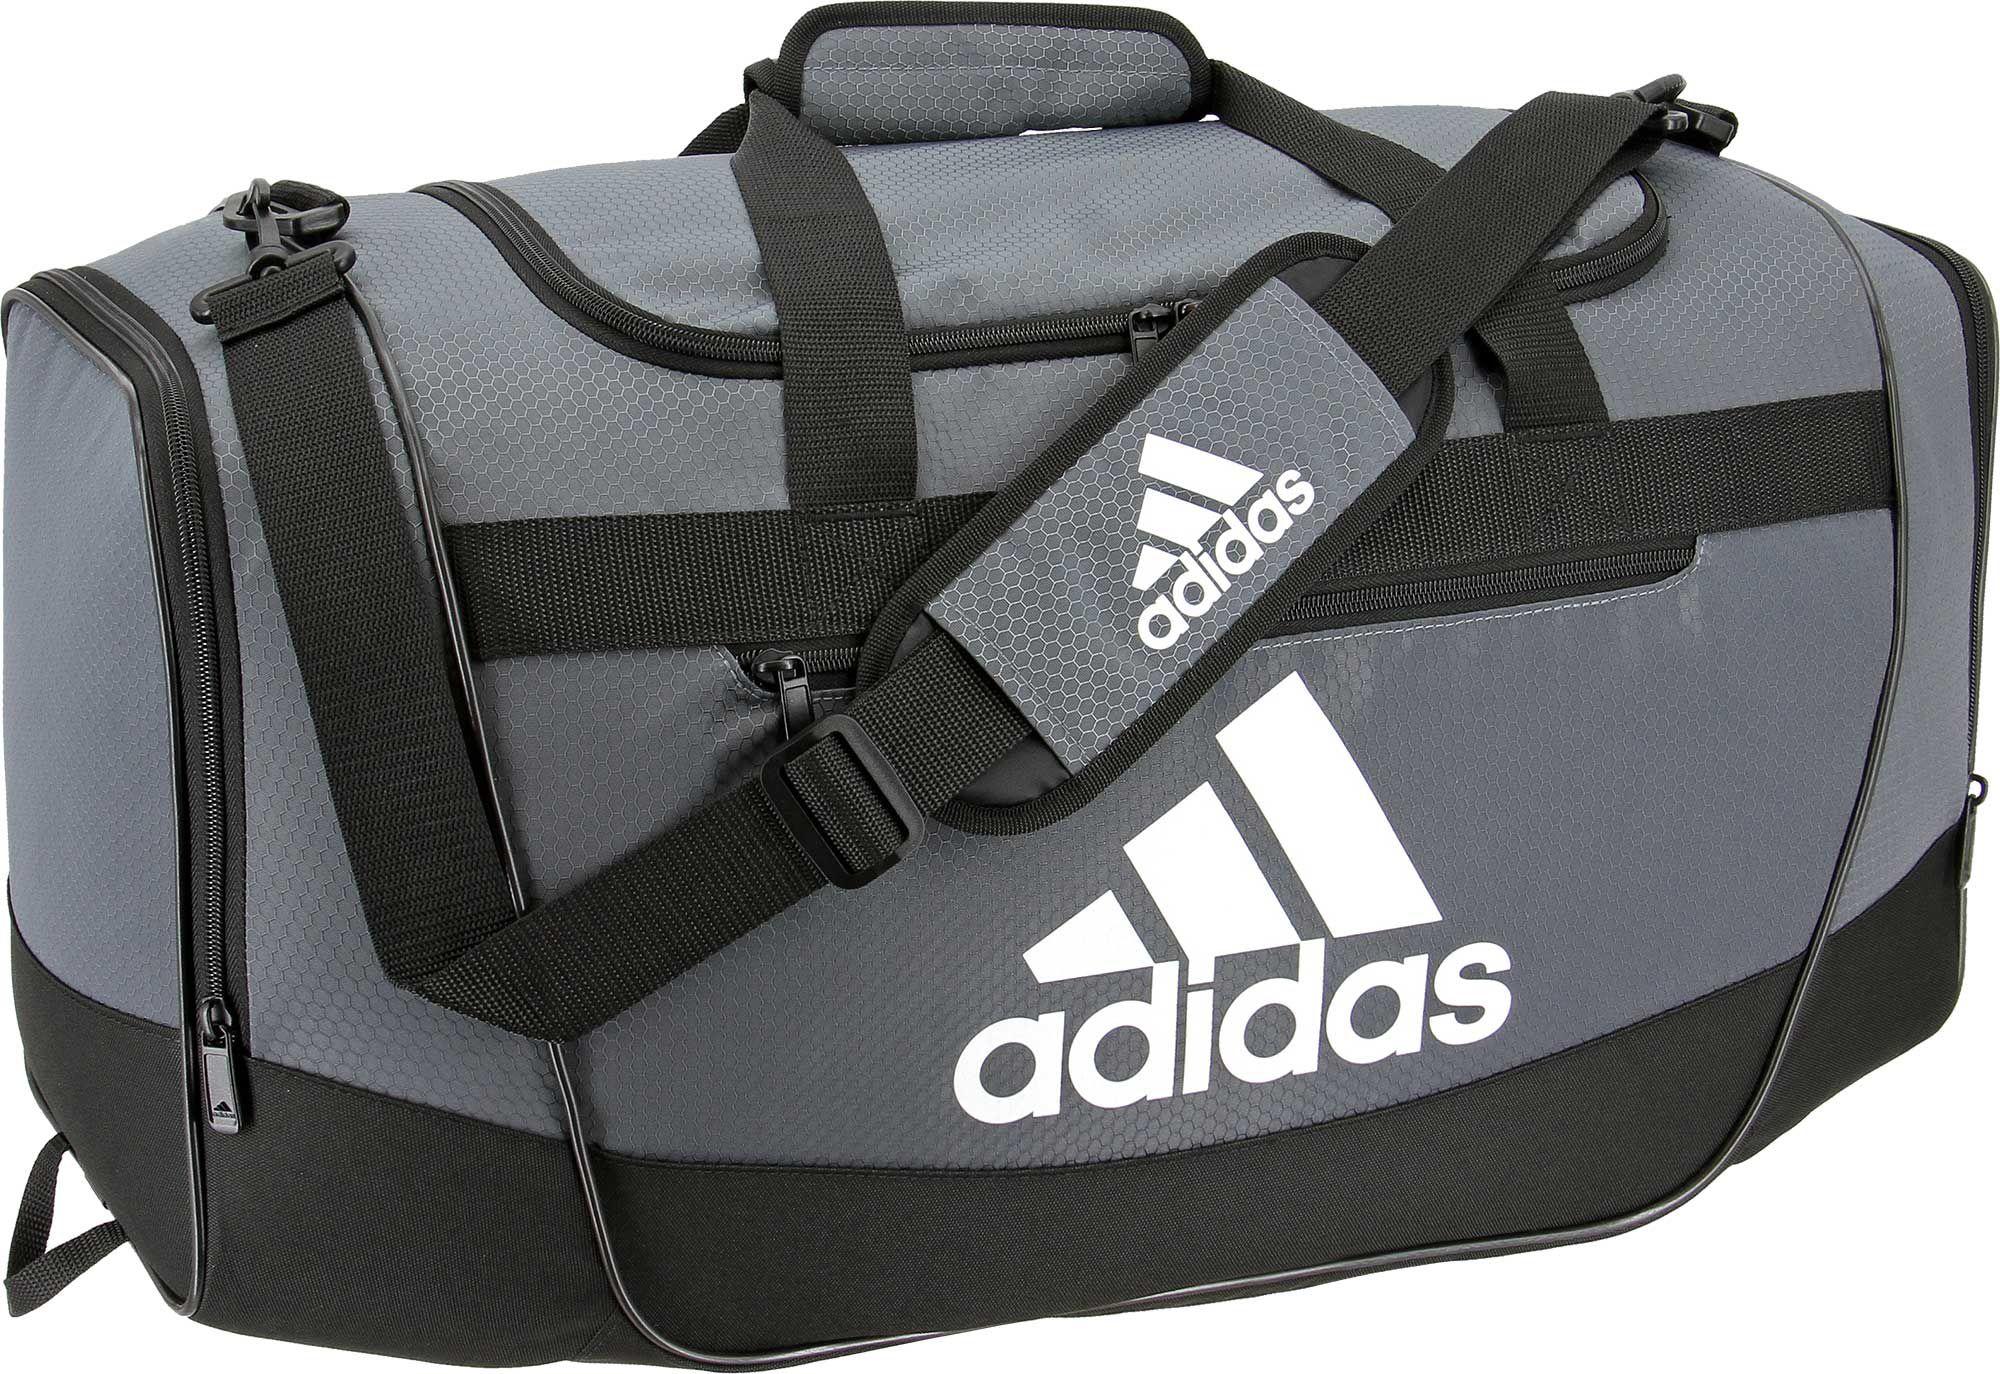 adidas duffle bag noimagefound ??? BYWJZAK